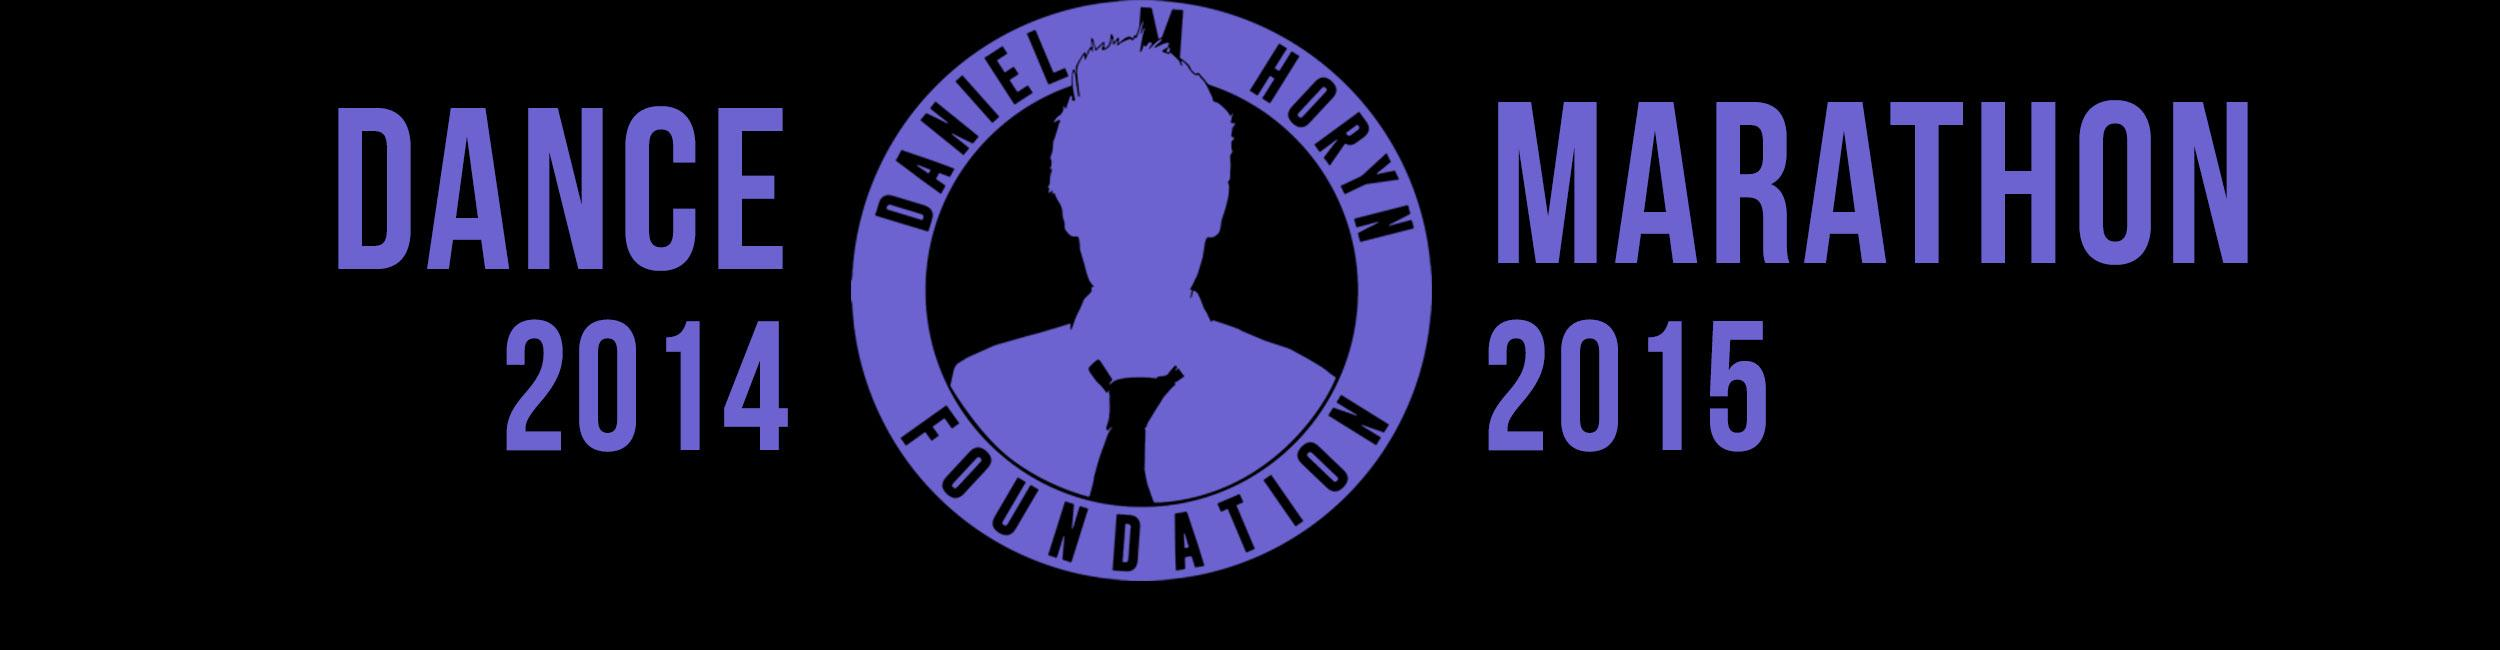 Dance Marathon welcomes the Dan Horyn Foundation